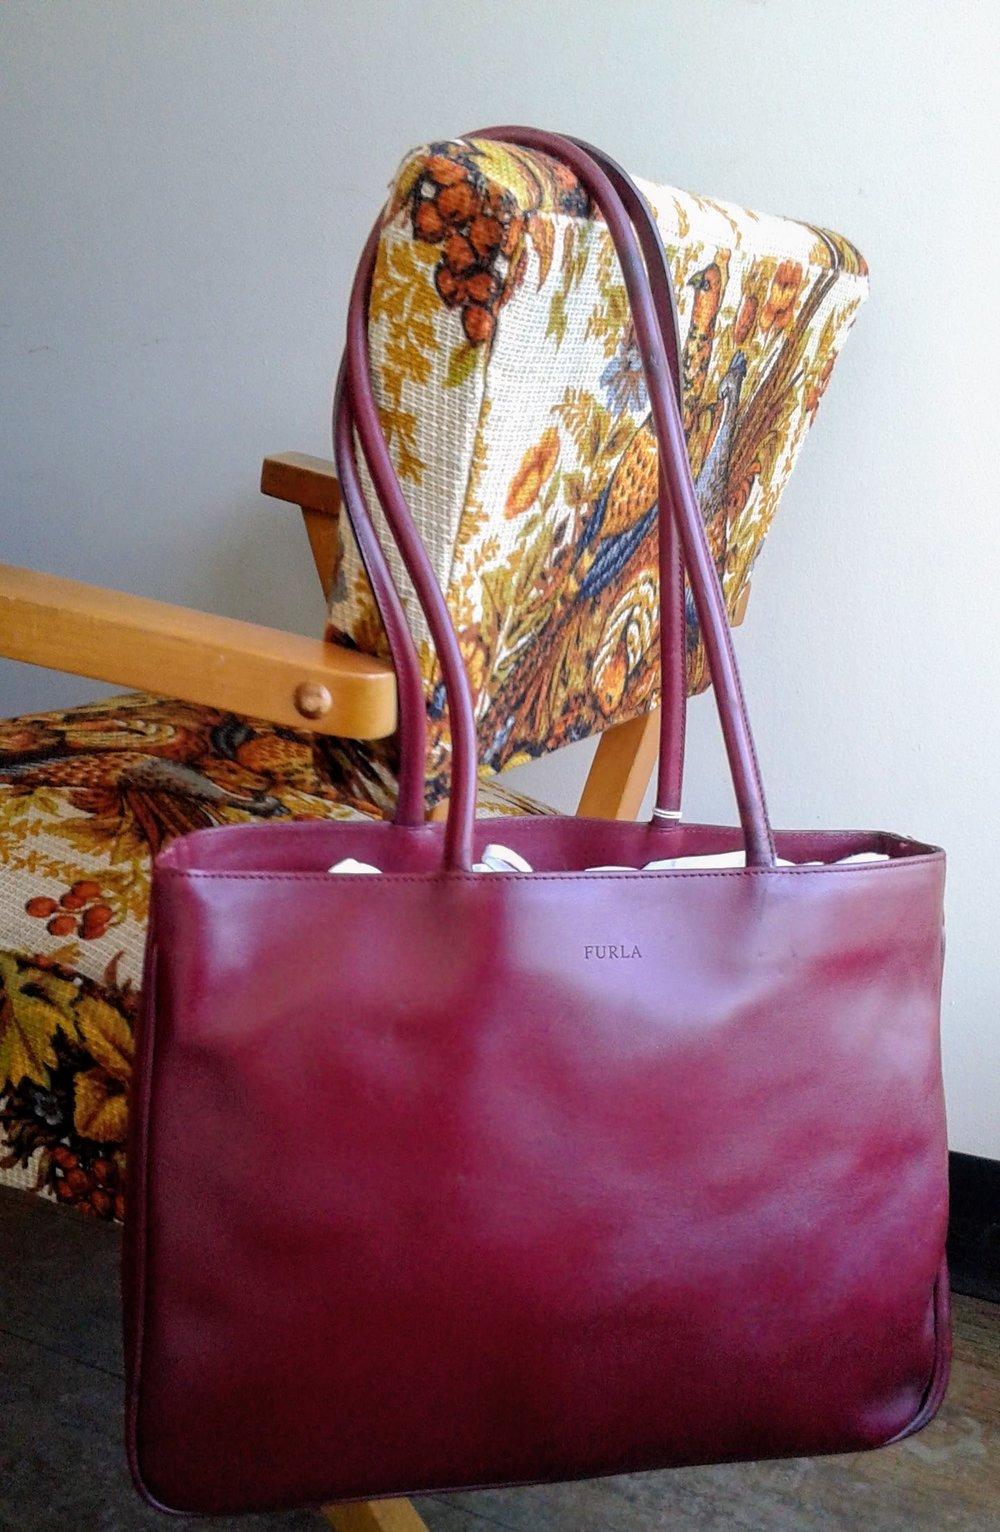 Furla bag, $75